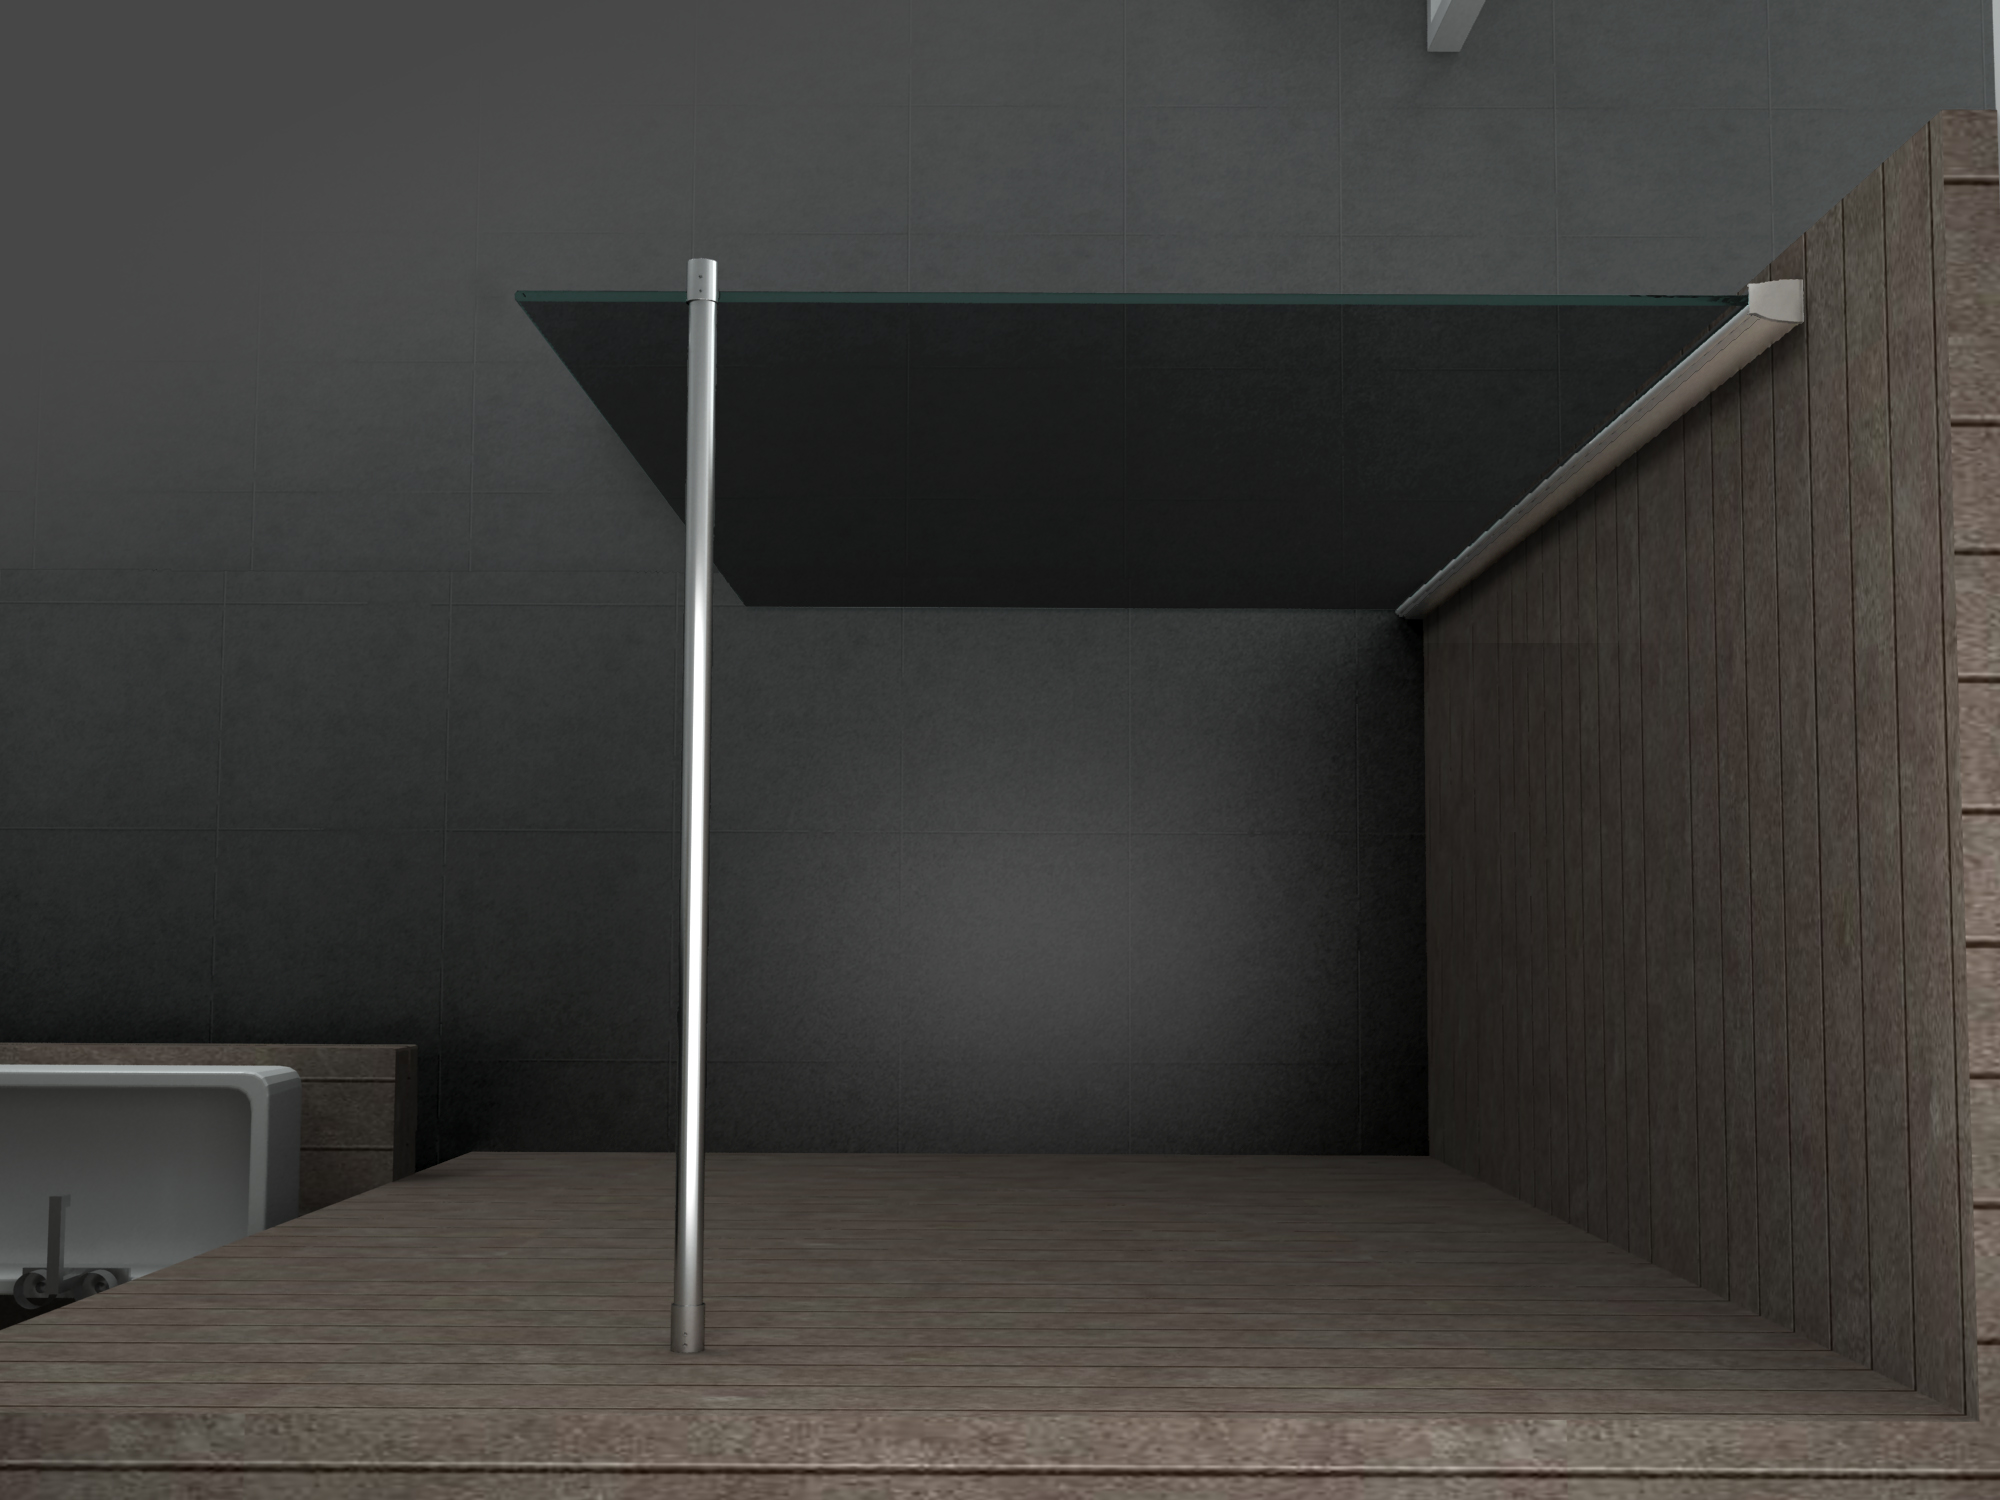 10 mm Duschwand AQUOS-SMOKE 120 x 200 cm